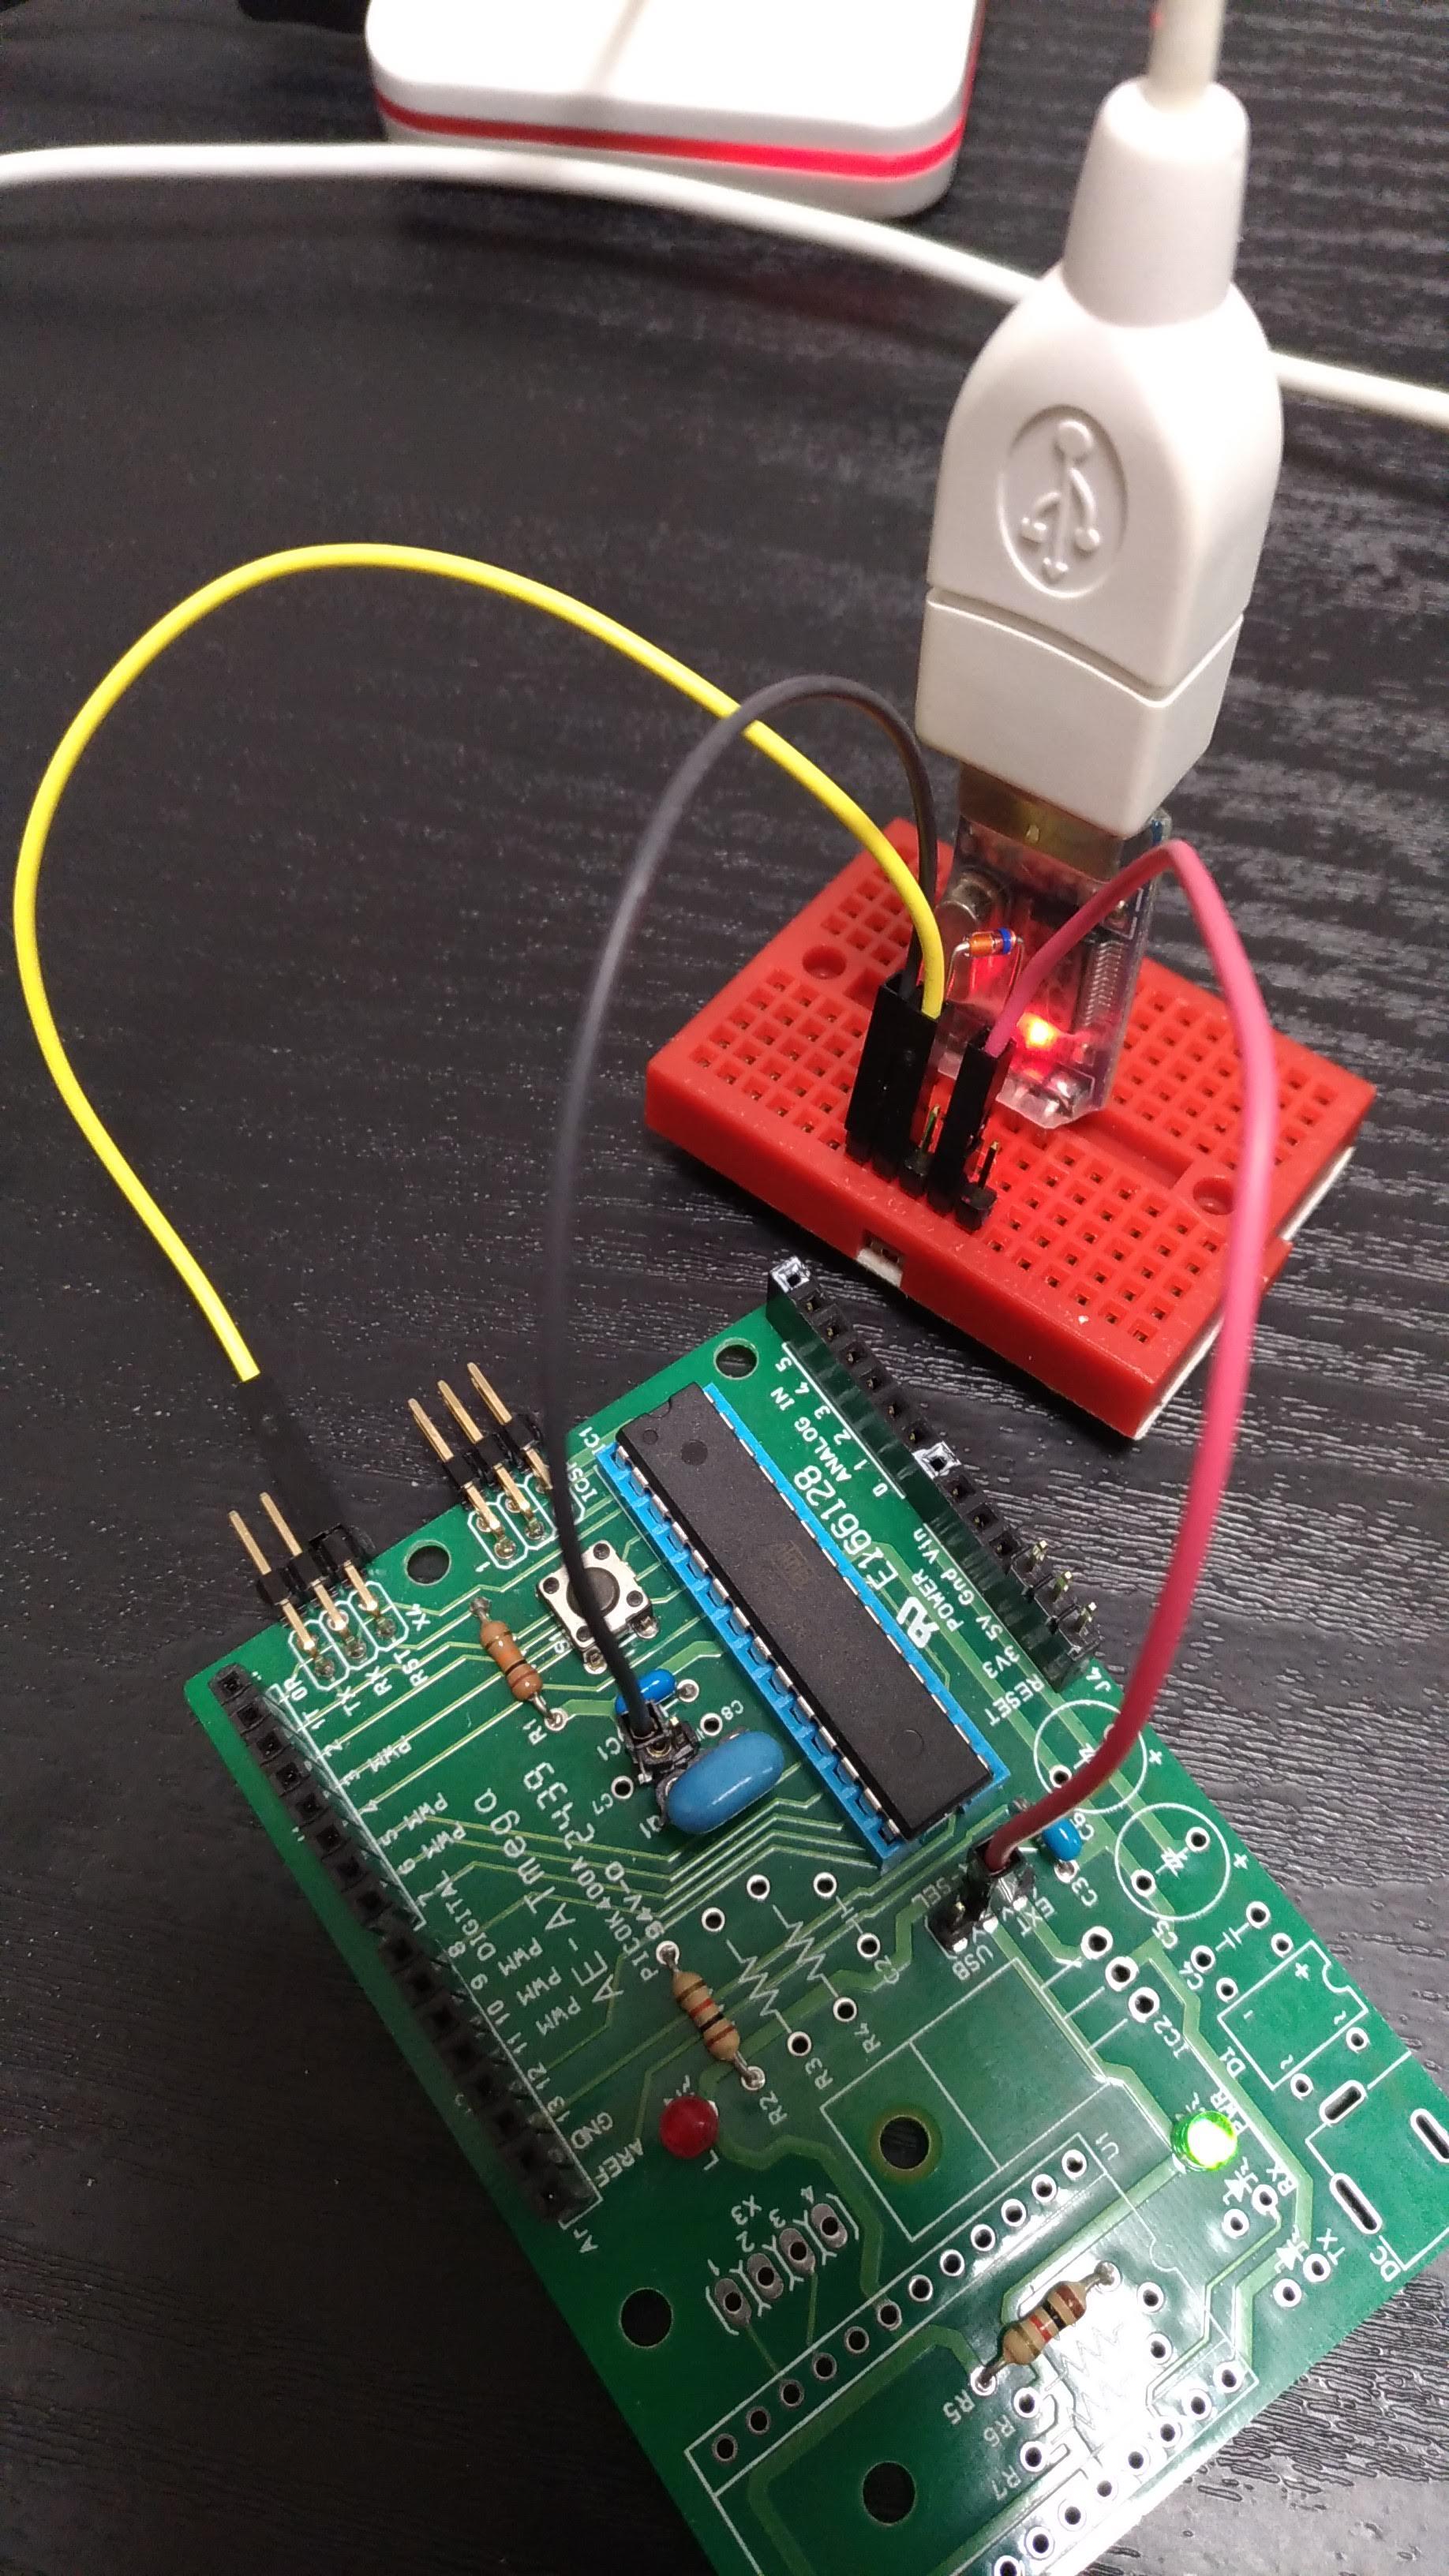 dwire-debug-on-pl2303hx-usb-uart-adapter